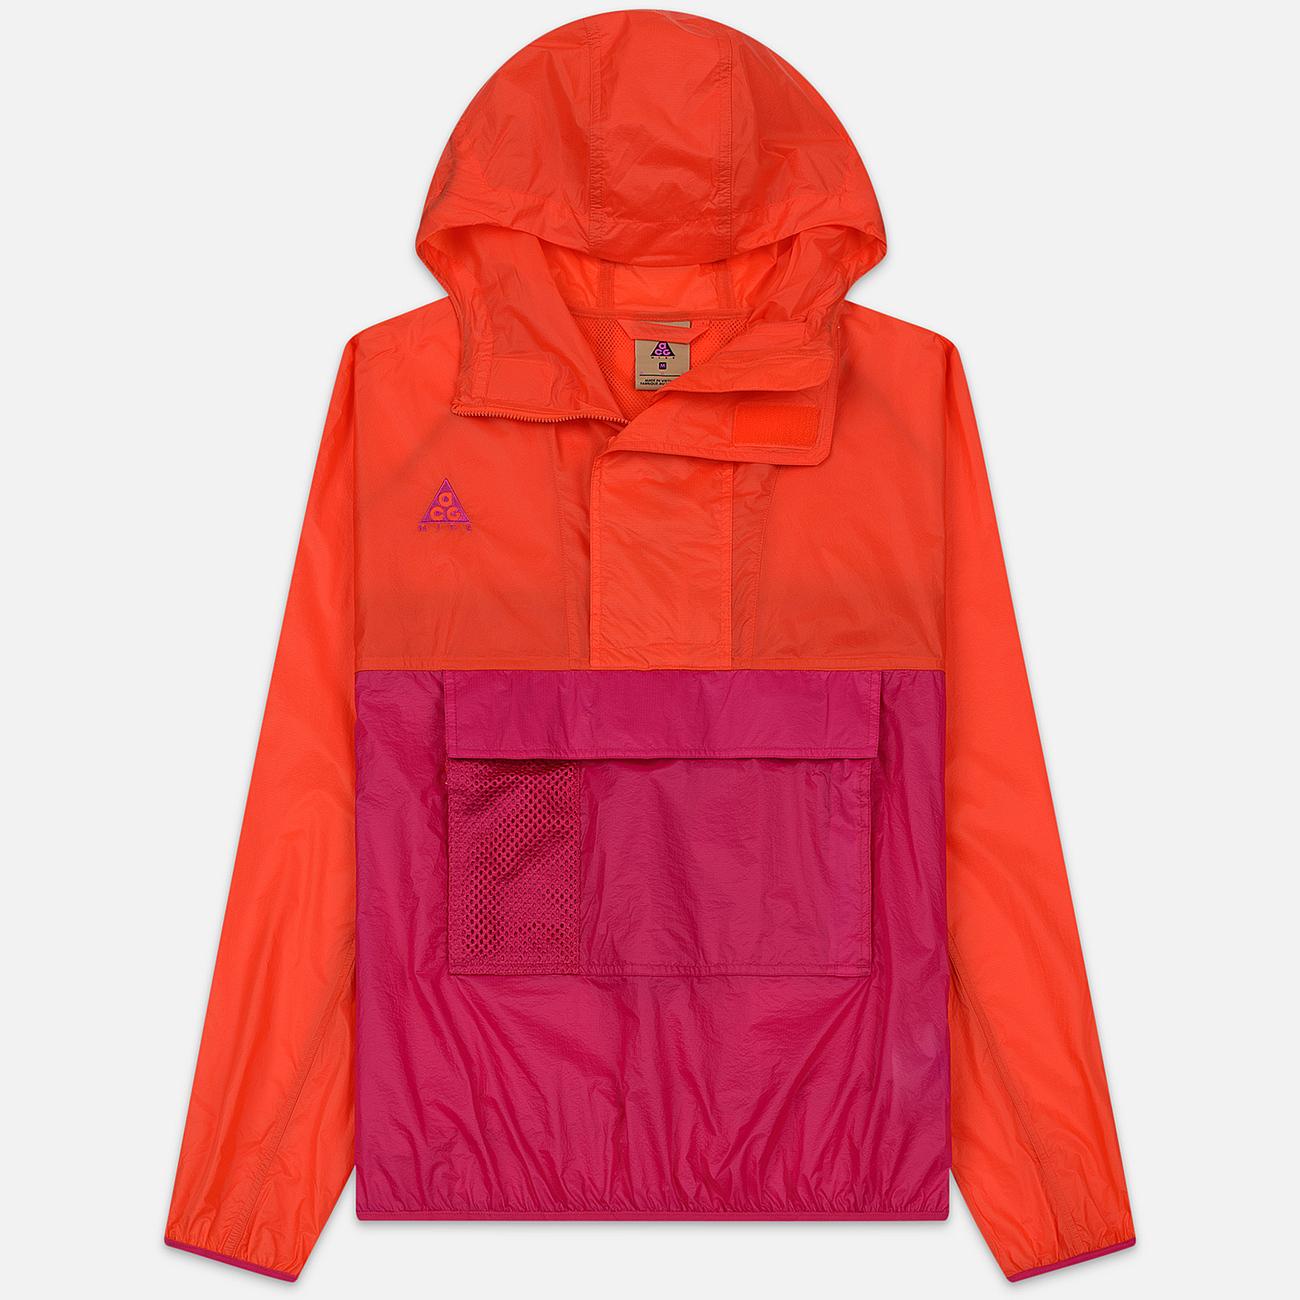 Мужская куртка анорак Nike ACG NRG Hoodie Habanero Red/Sport Fuchsia/Sport Fuchsia